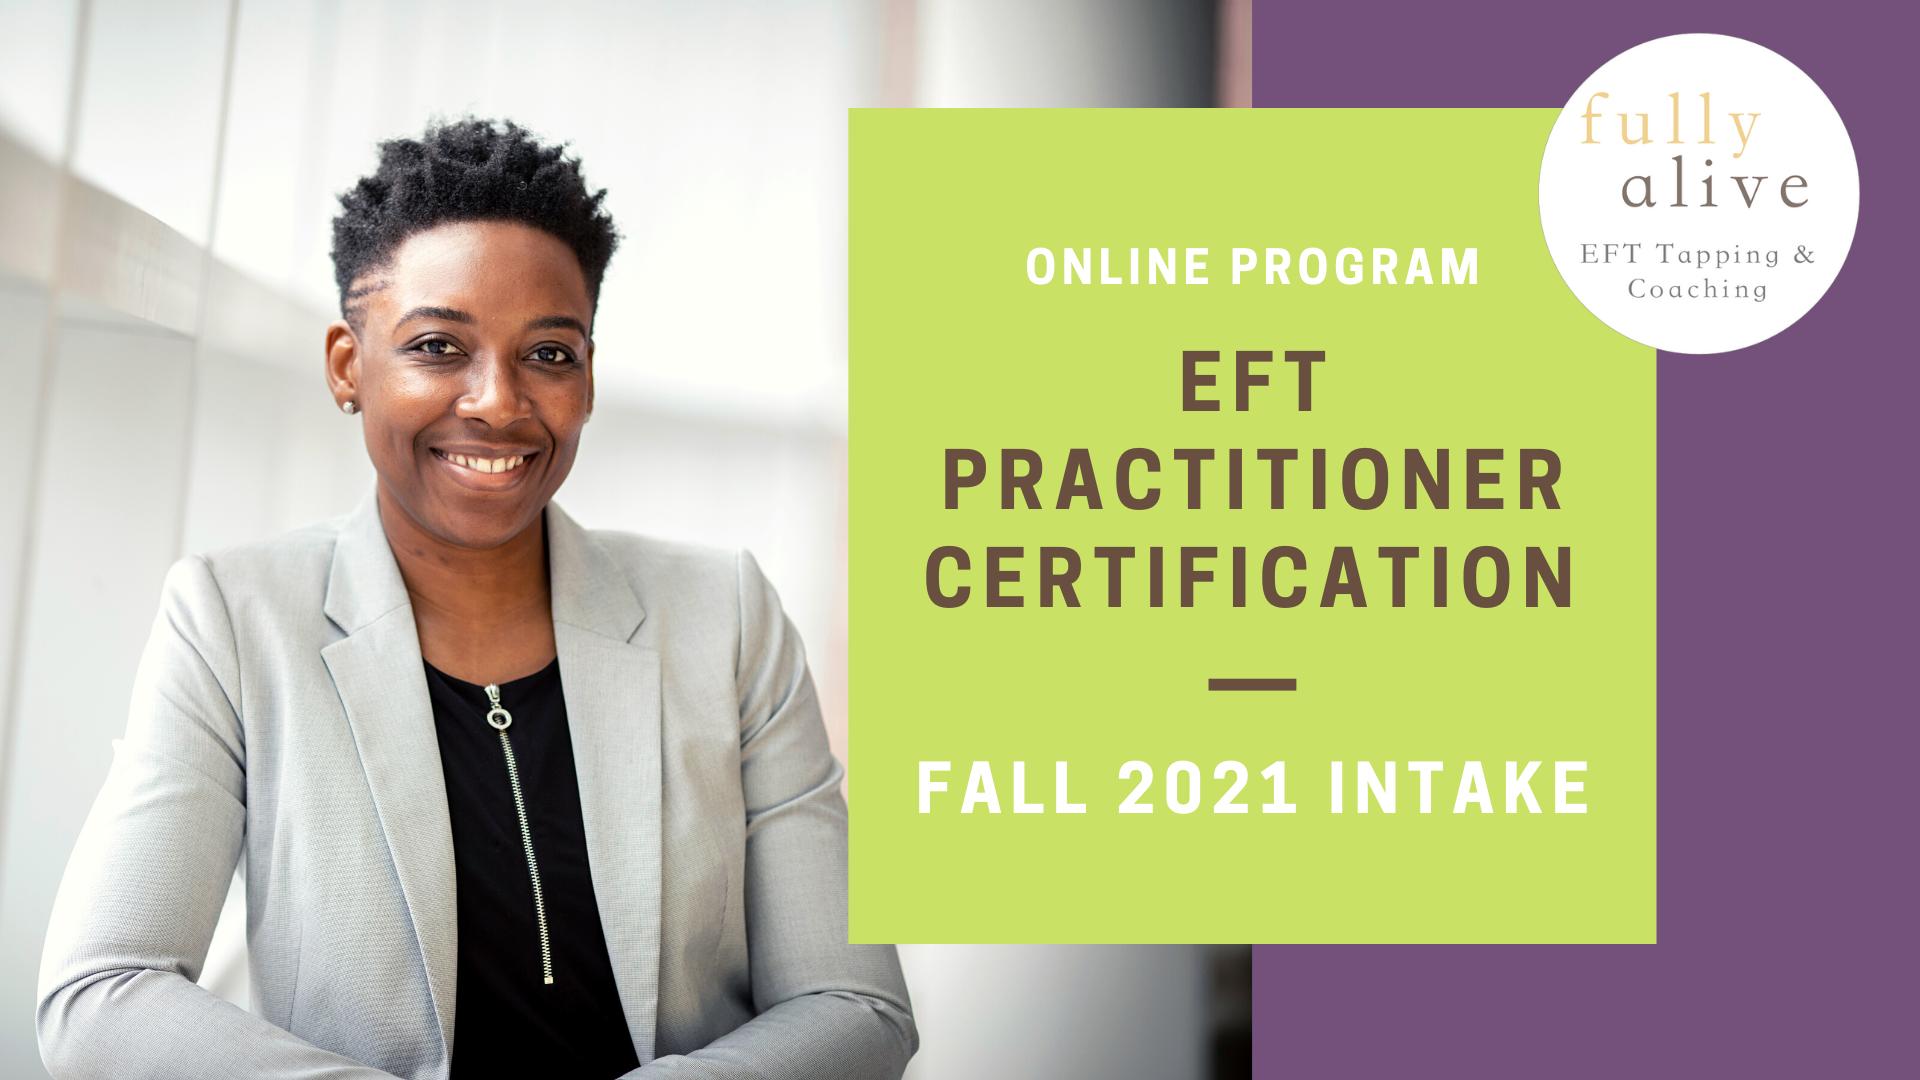 EFT tapping training - EFT practitioner certification program flyer - Fall 2021 intake